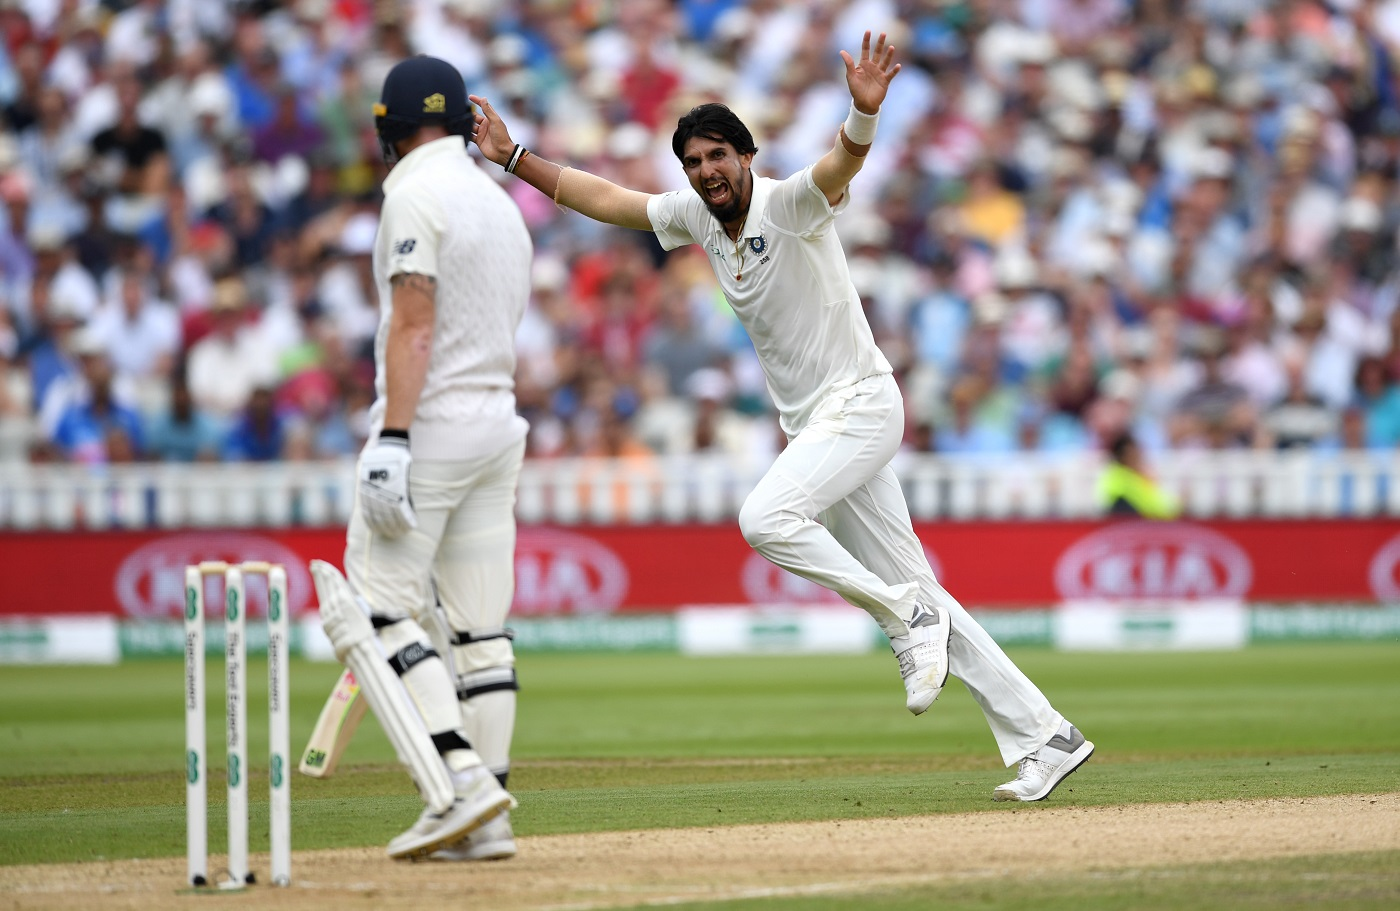 ENG vs India 2018: India Can Win First Test Provided Other Batsmen Support Virat Kohli: Sourav Ganguly